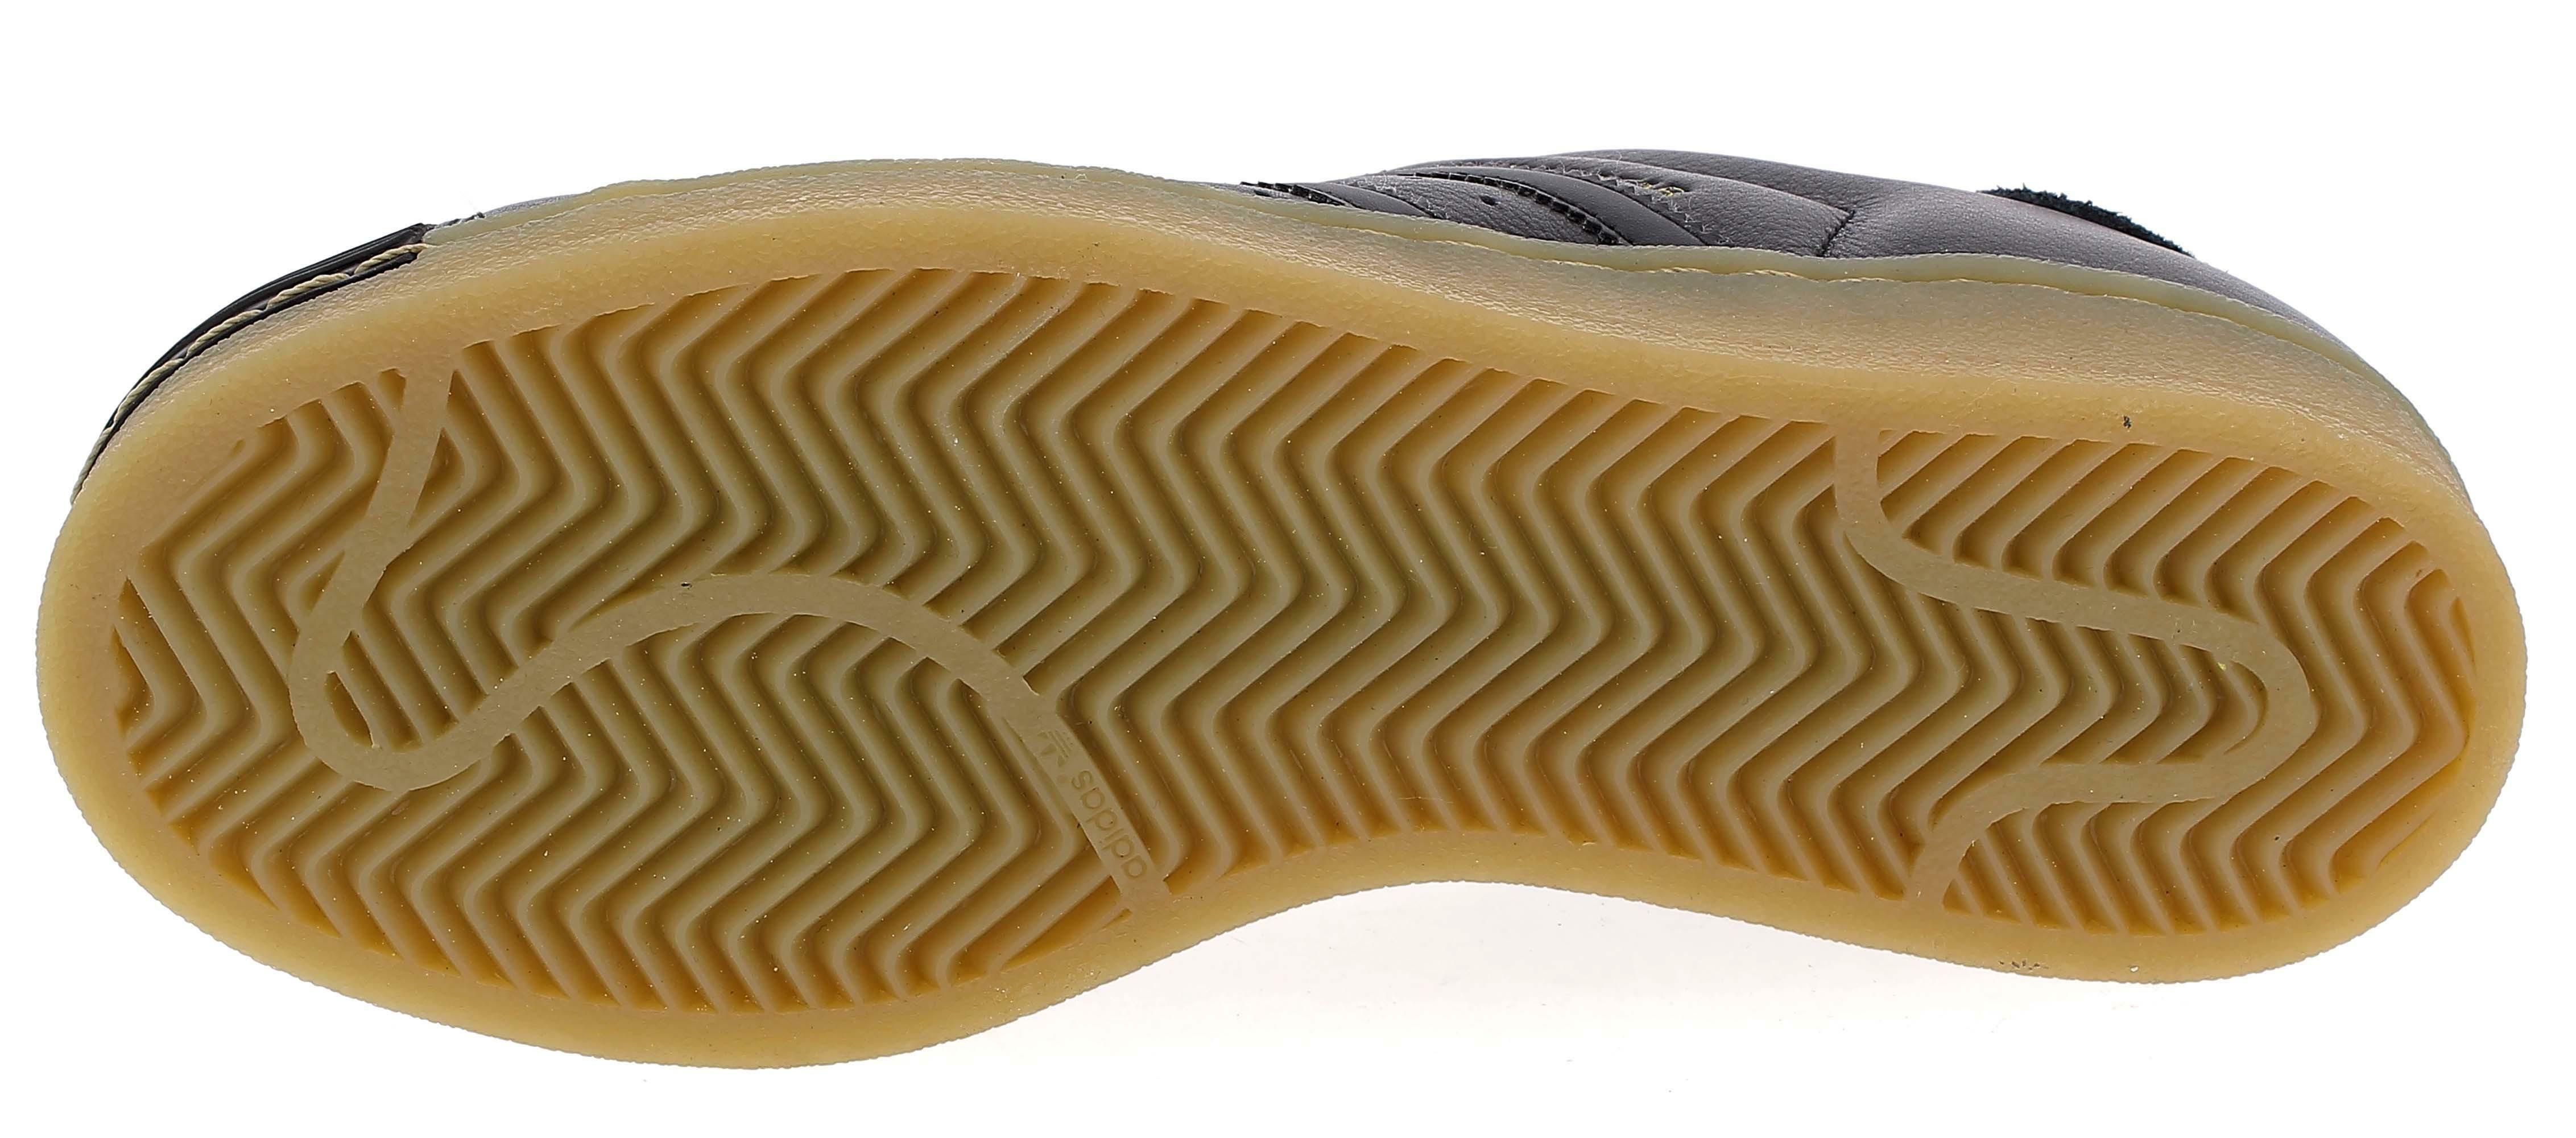 adidas superstar w scarpe sportive donna nere b37148